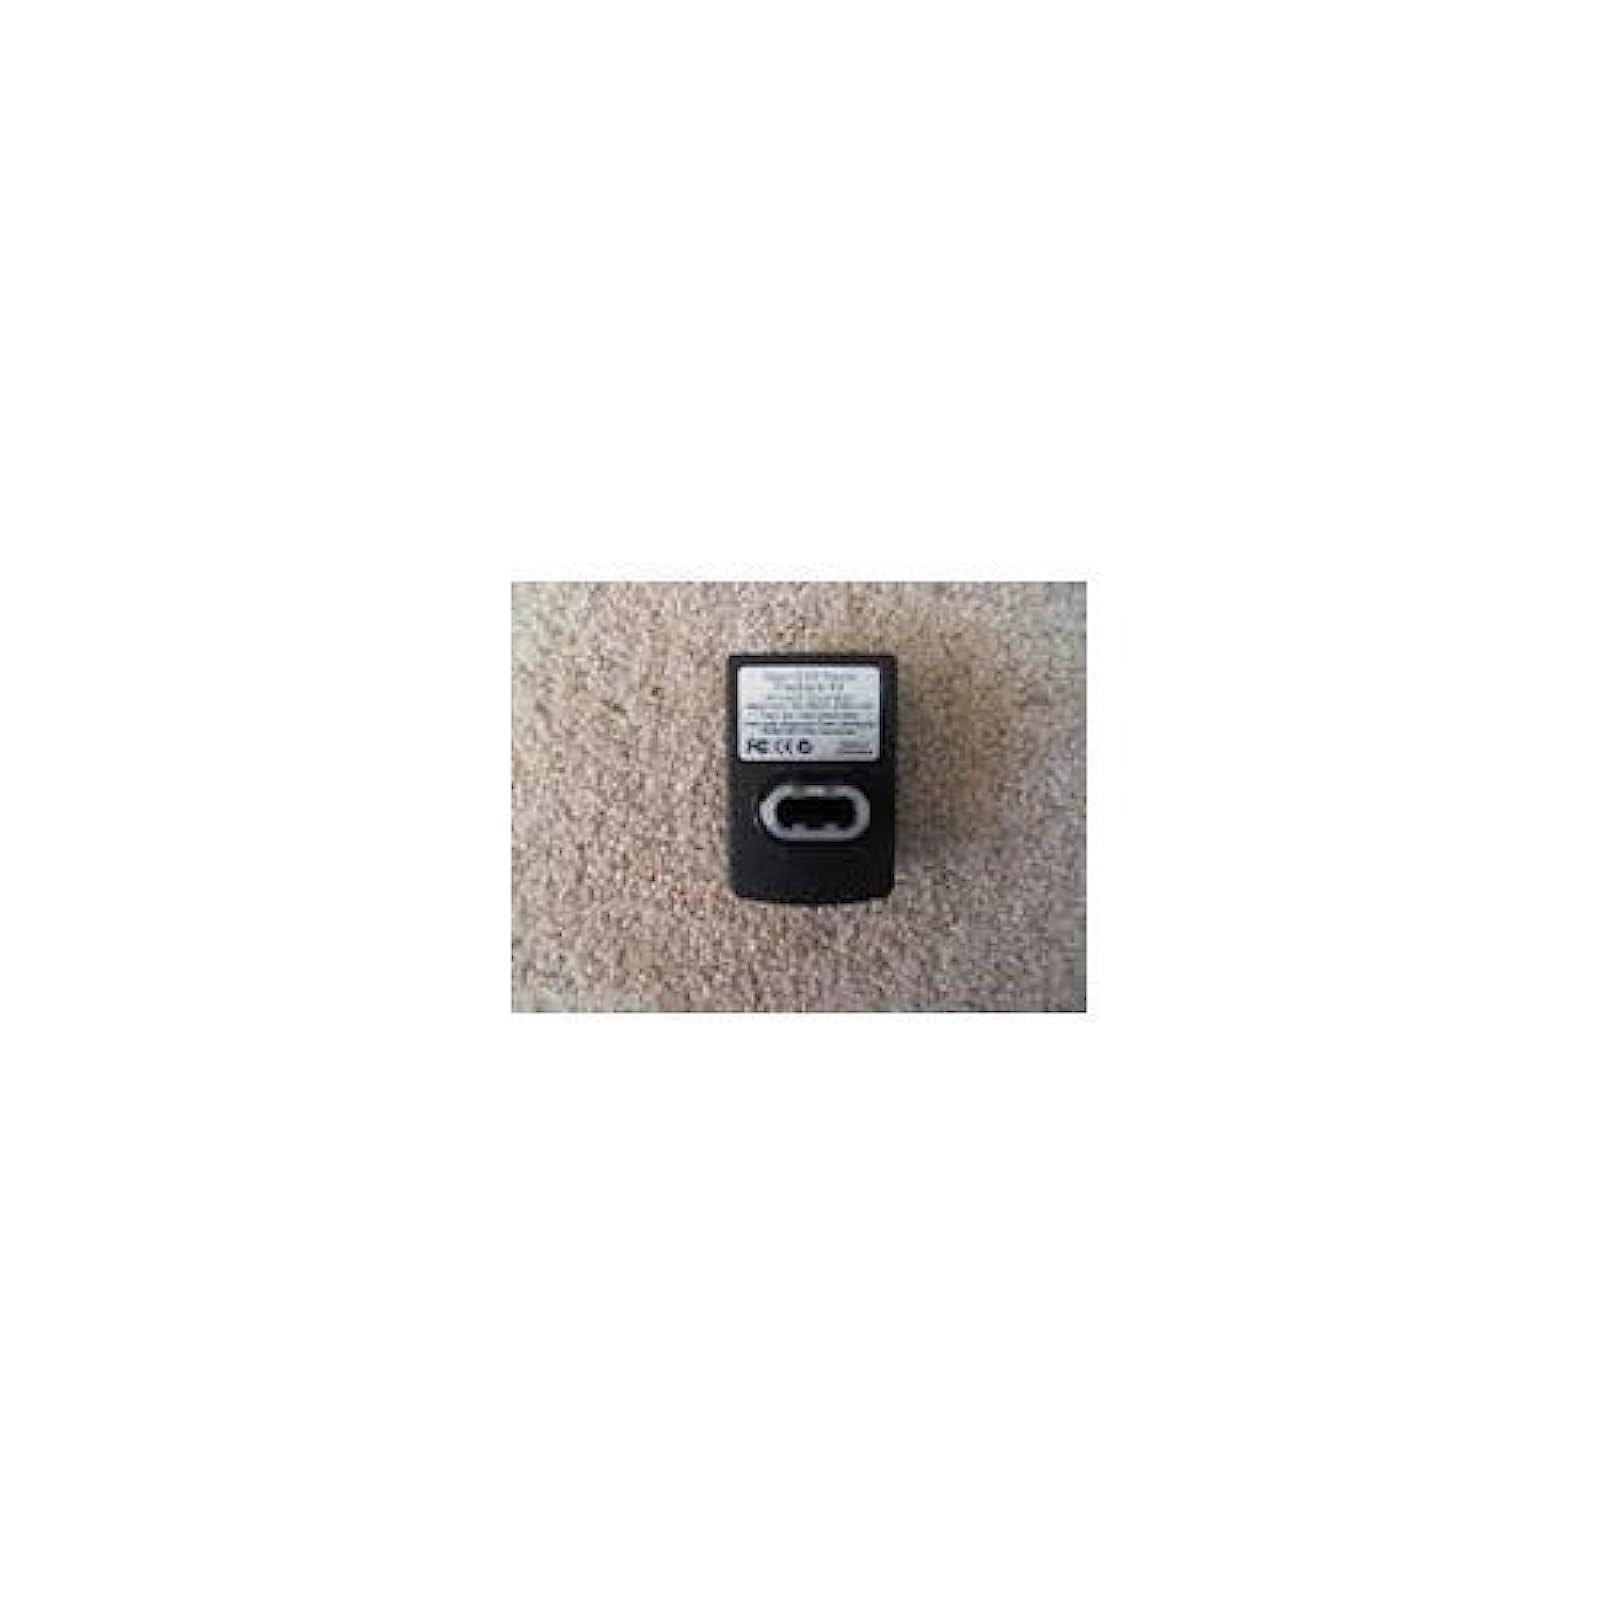 Original Xbox DVD Movie Playback Kit Remote Receiver Only Model #X08-2